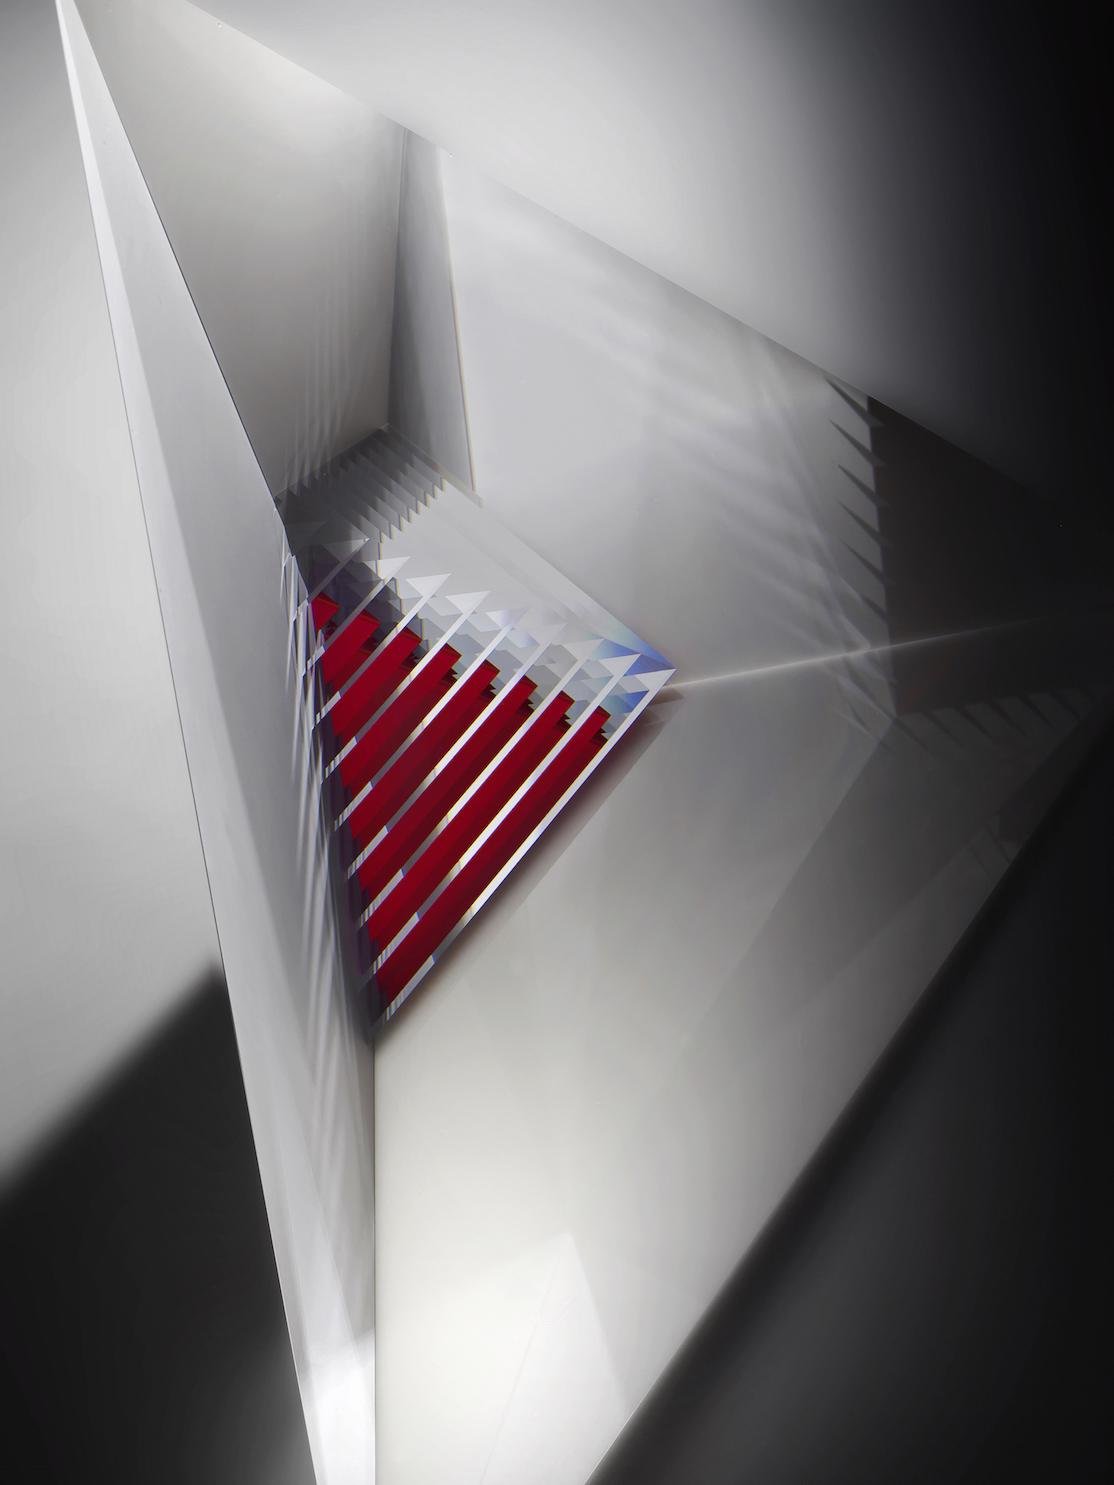 glassarchitectureredpyramide_2013_oliver_lesso_470x420x - Copy